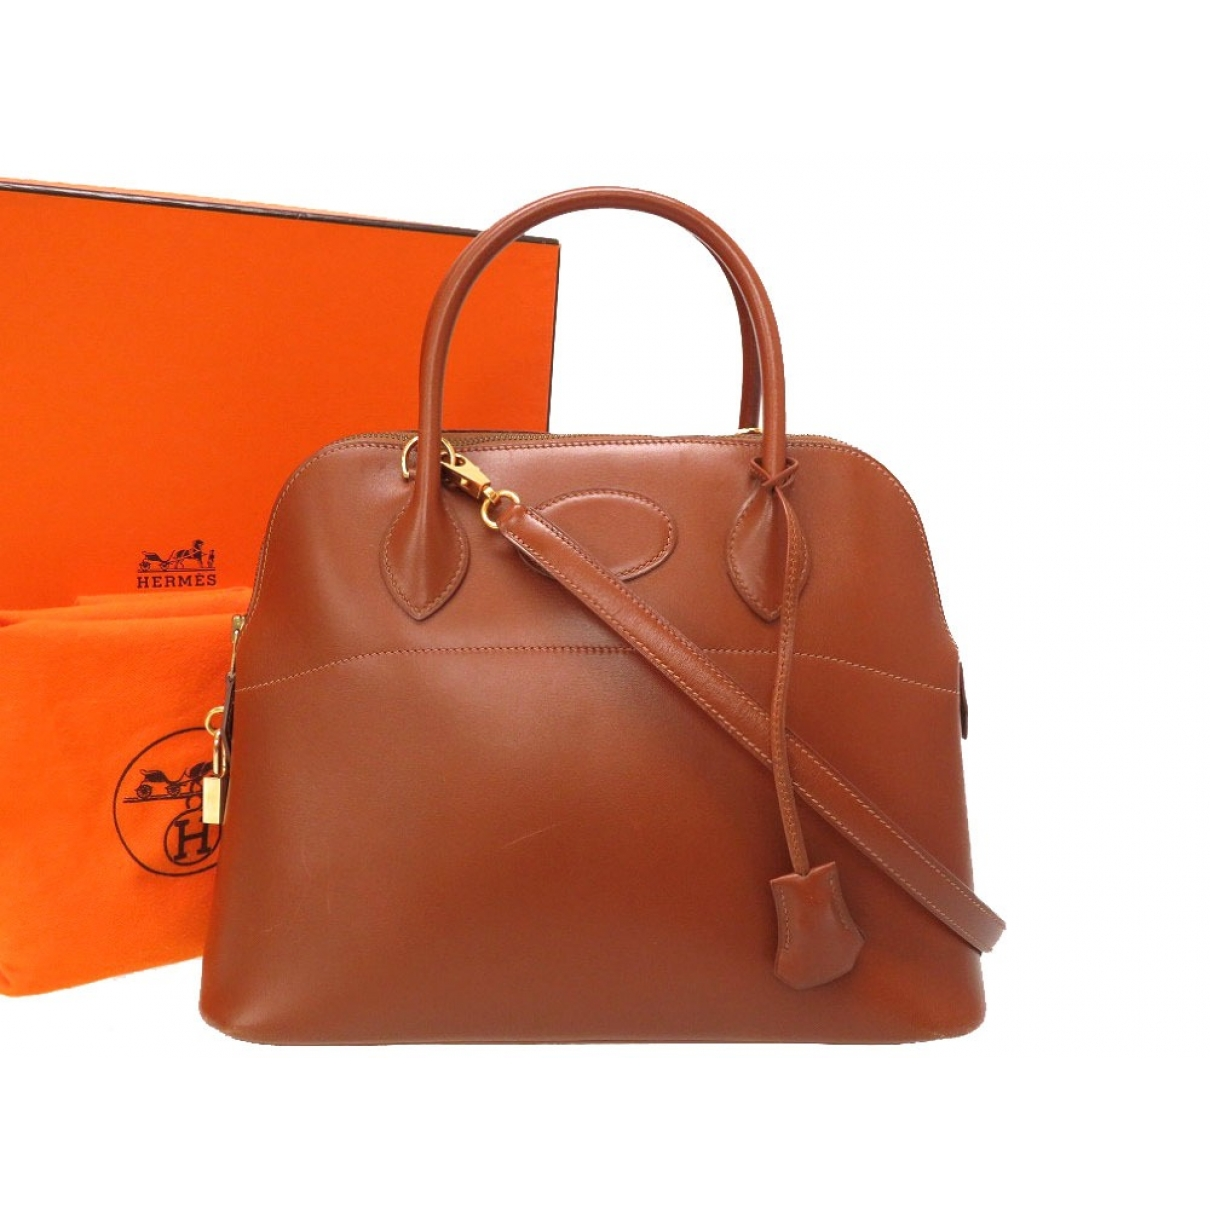 Hermes Bolide Handtasche in  Braun Leder